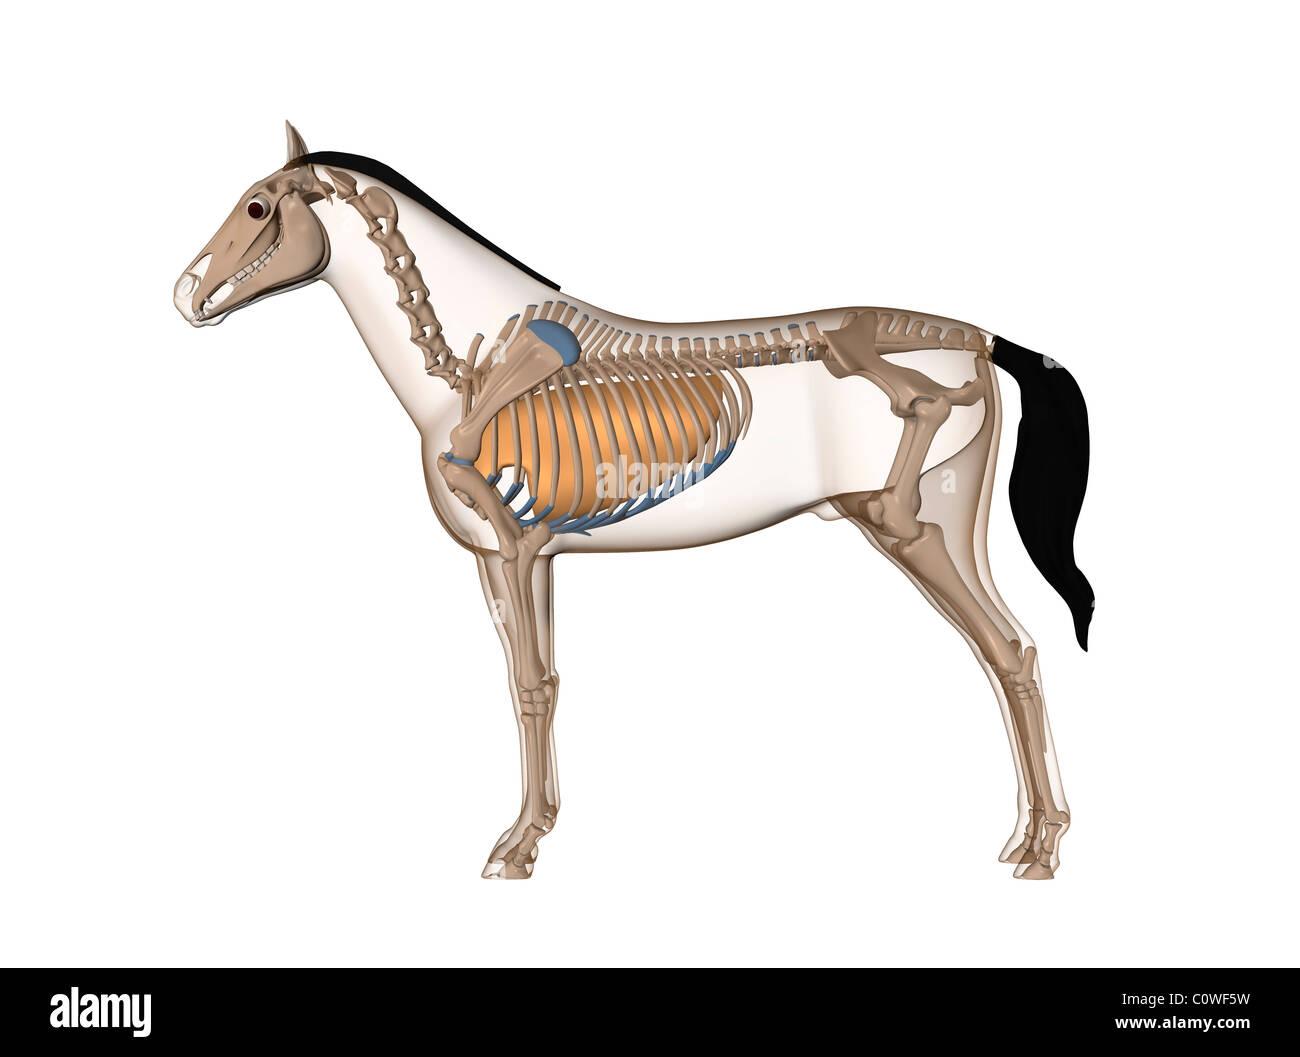 Horse Skeleton Illustration Stockfotos & Horse Skeleton Illustration ...